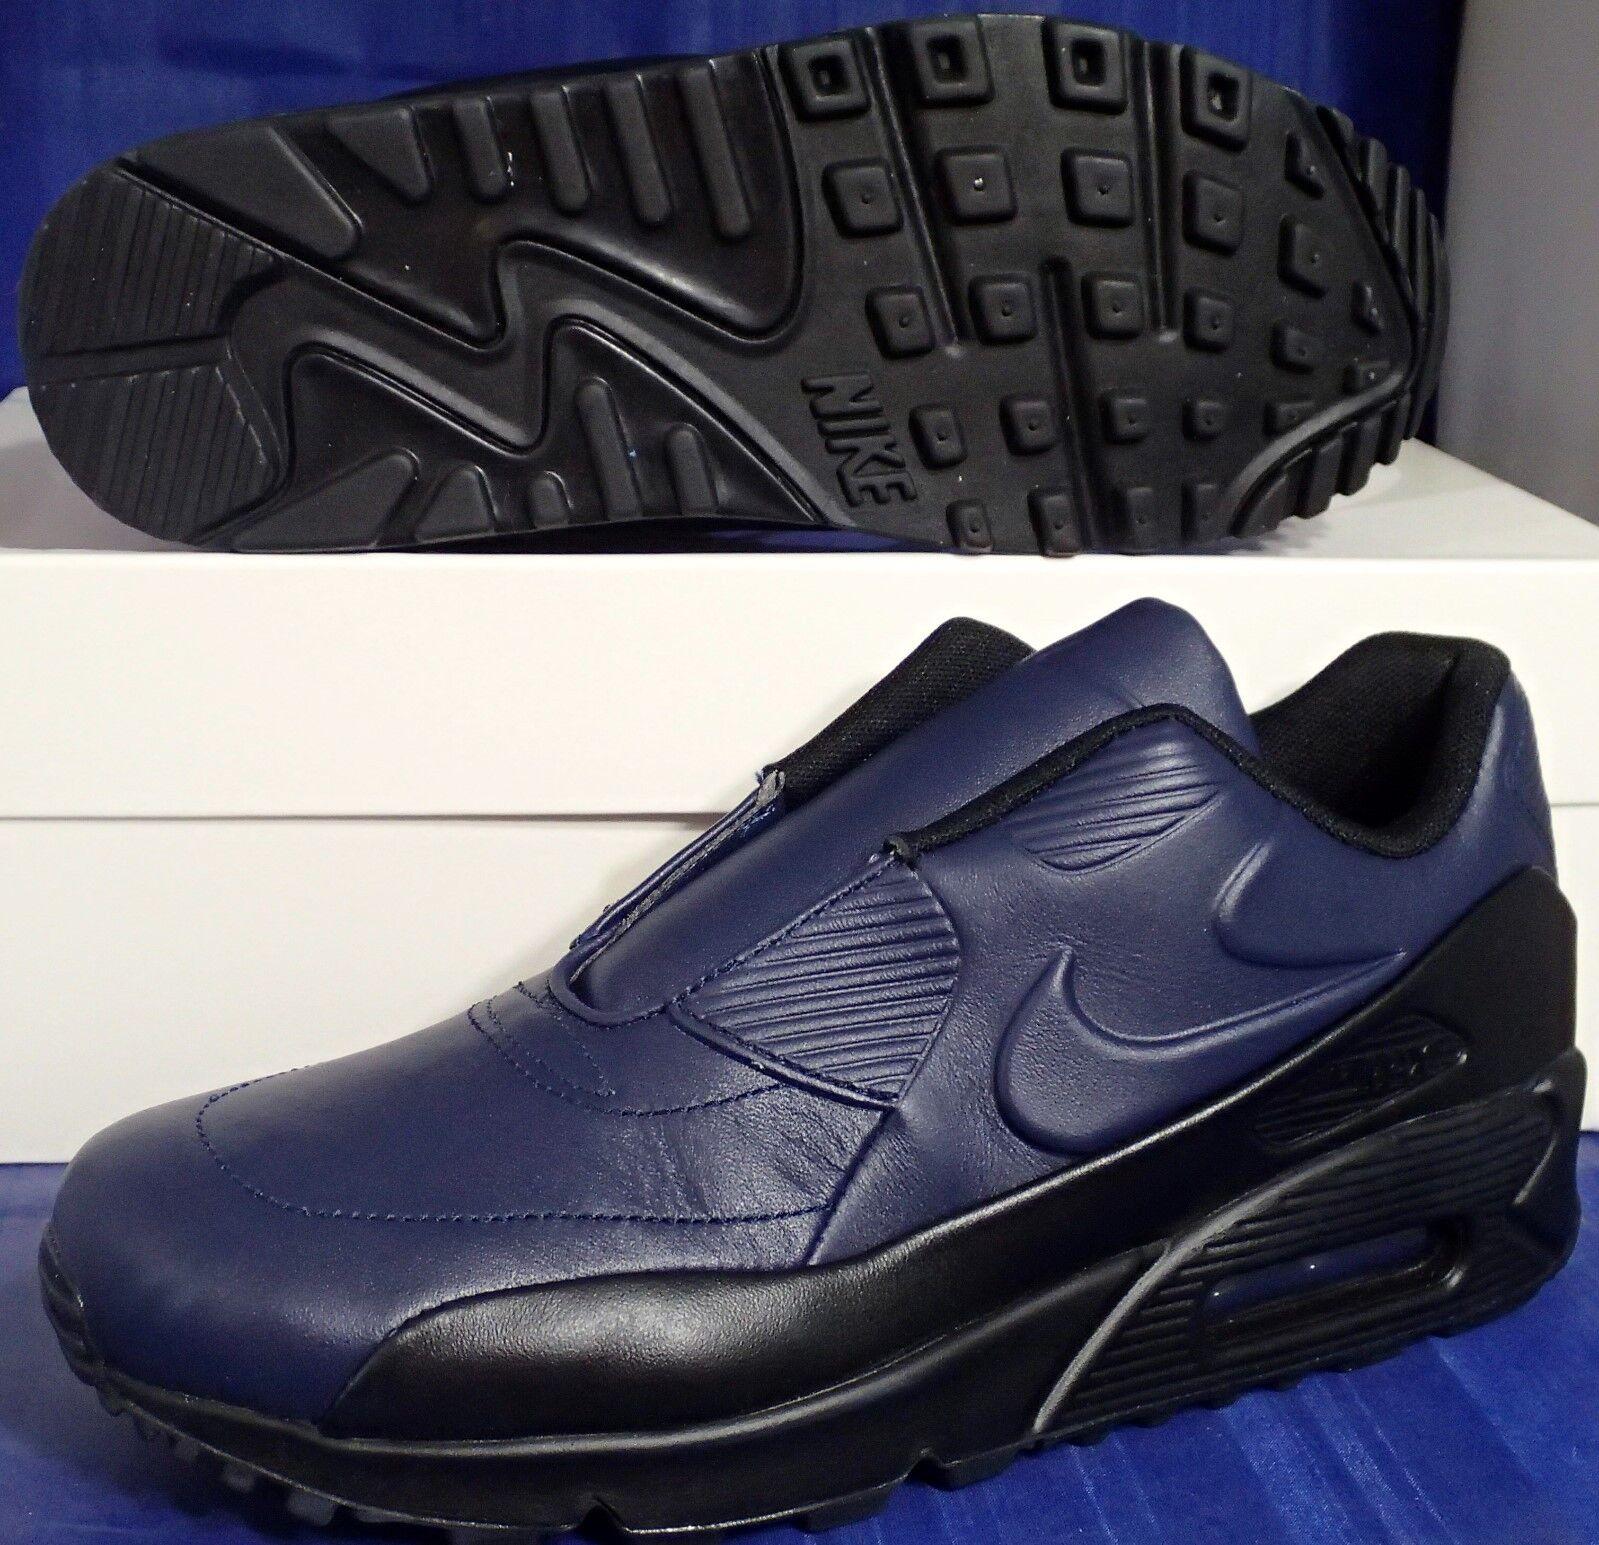 Womens Nike Air Max 90 SP Sacai NikeLab Obsidian bluee Black SZ 8.5 (804550-440)